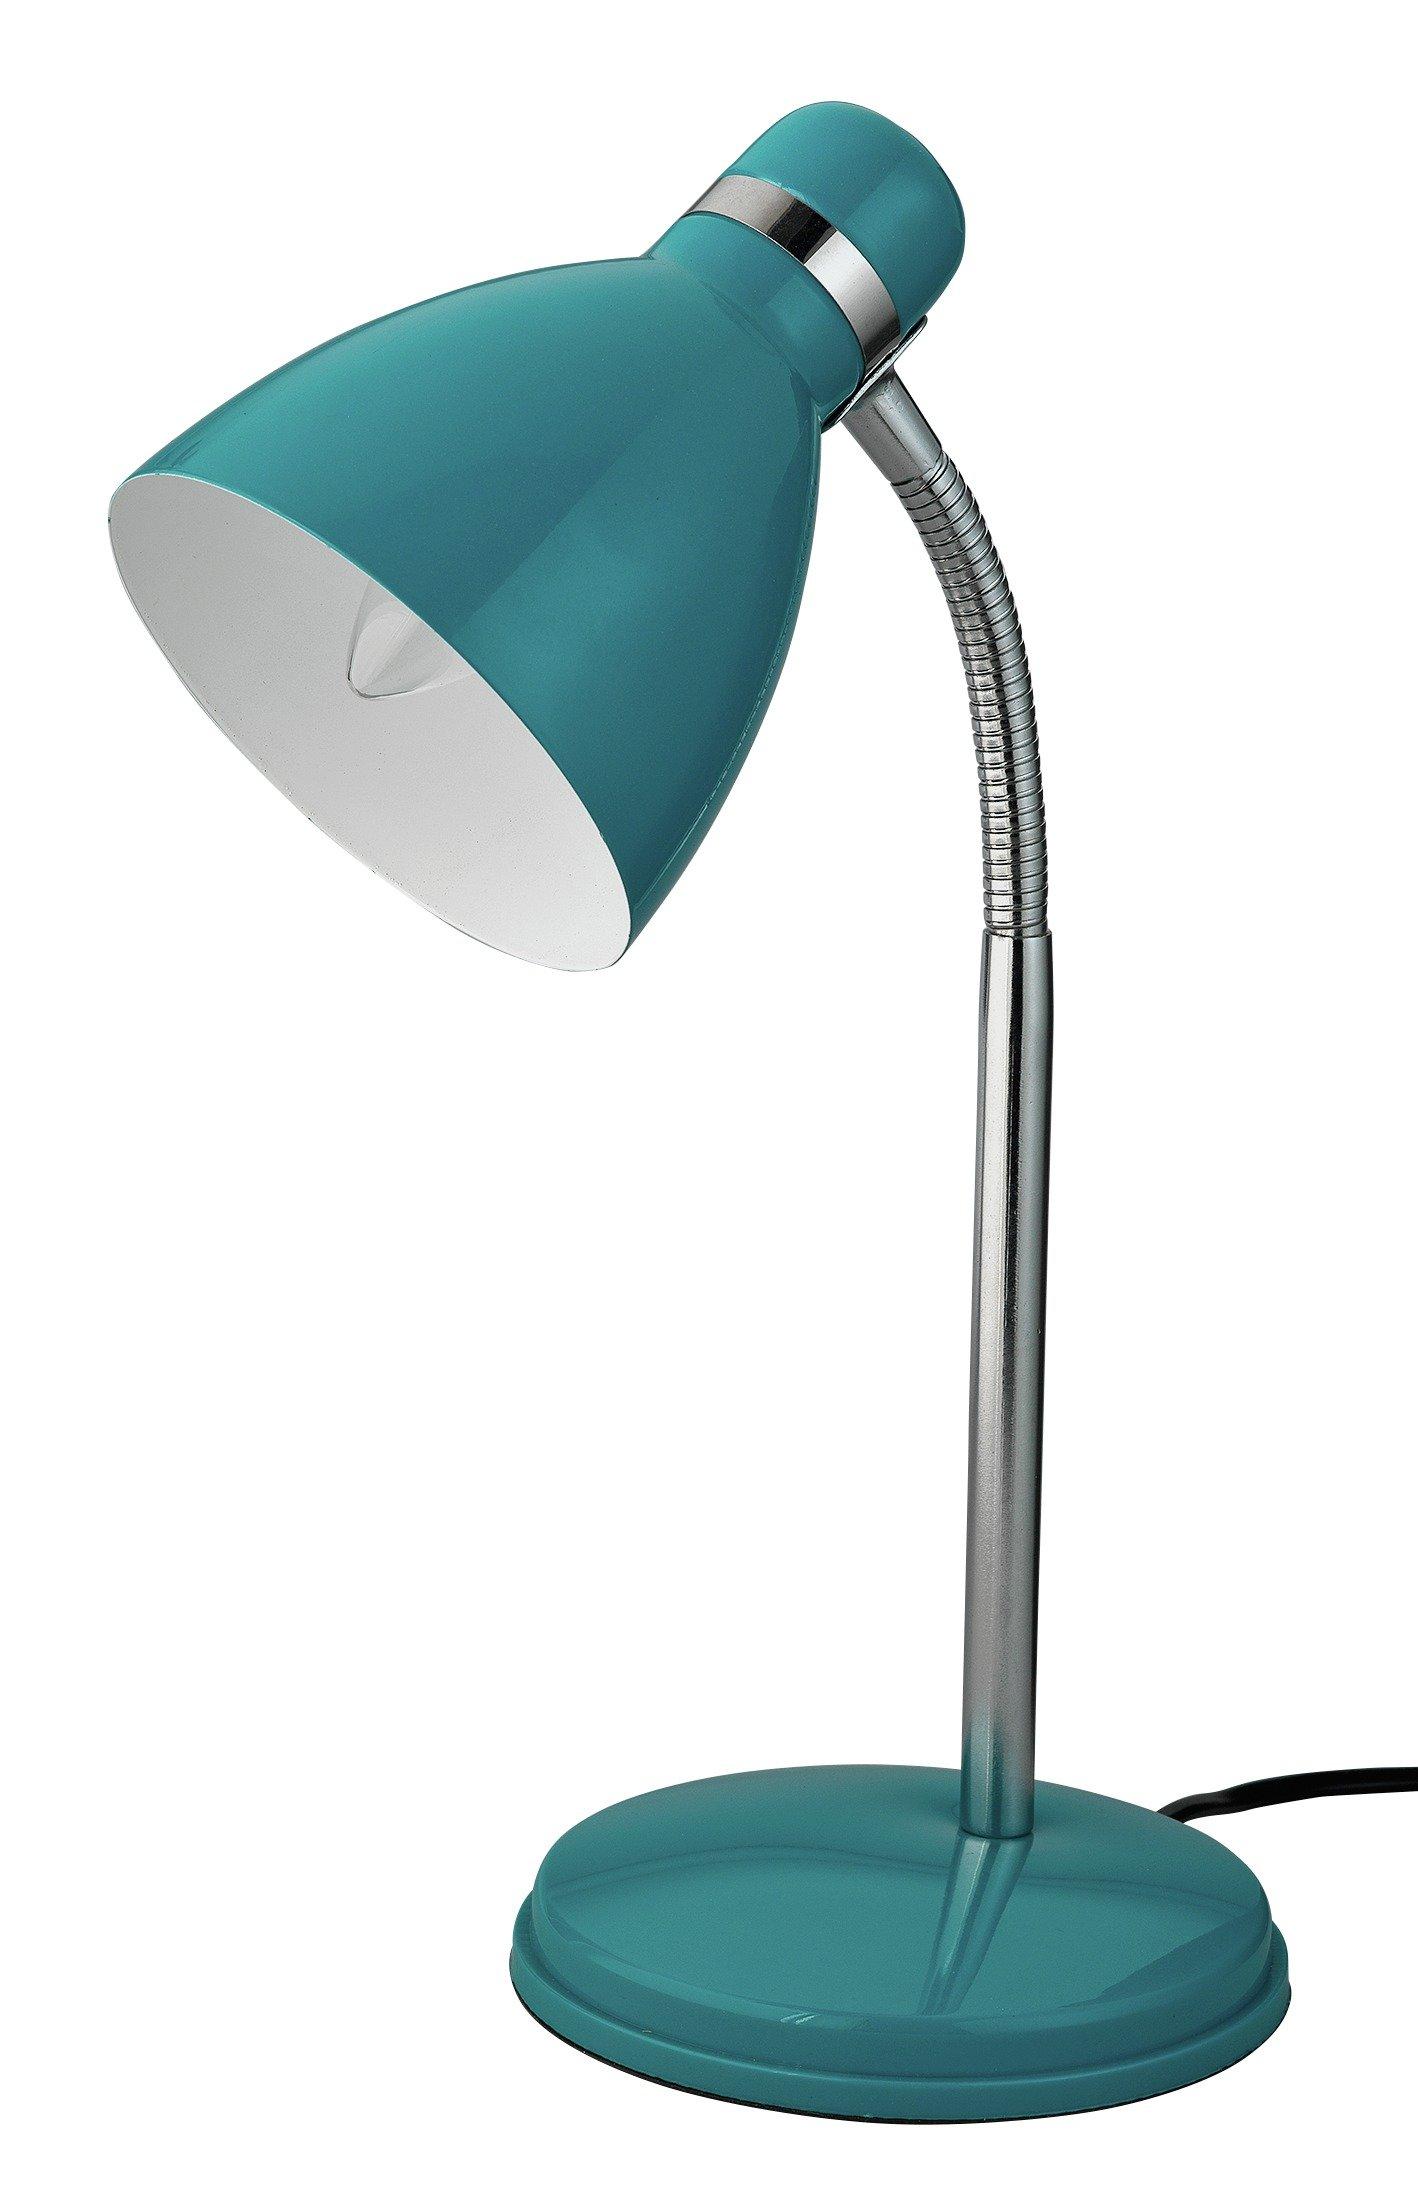 Argos Home Desk Lamp - Teal